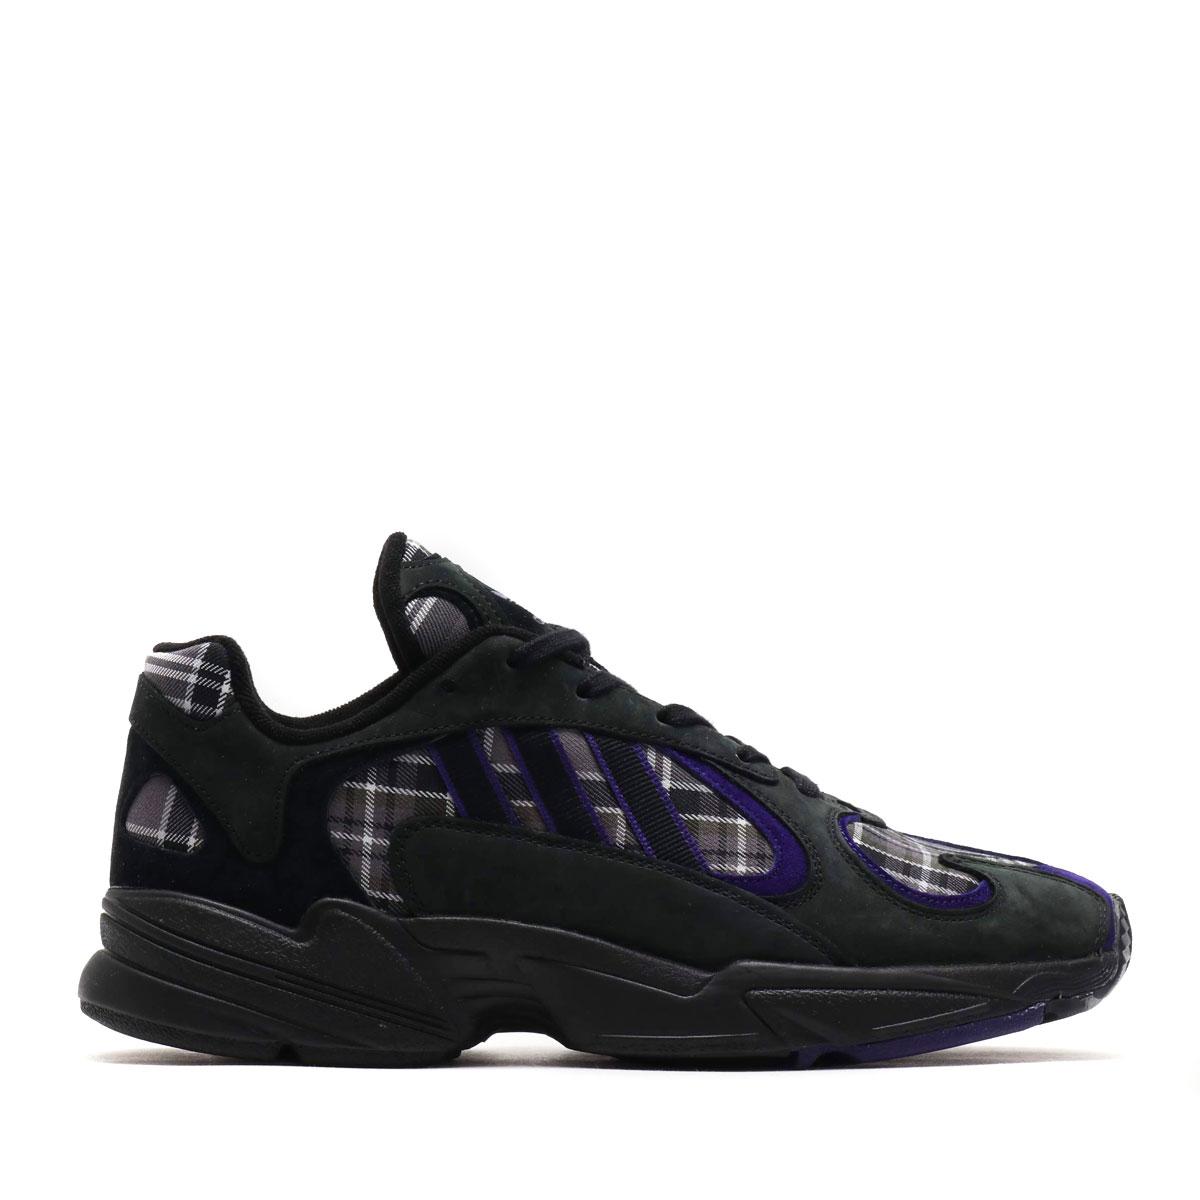 official photos d6130 464e9 adidas Originals YUNG-1 (CORE BLACKCOLLEGE PURPLECORE BLACK) (Adidas  originals young people -1)